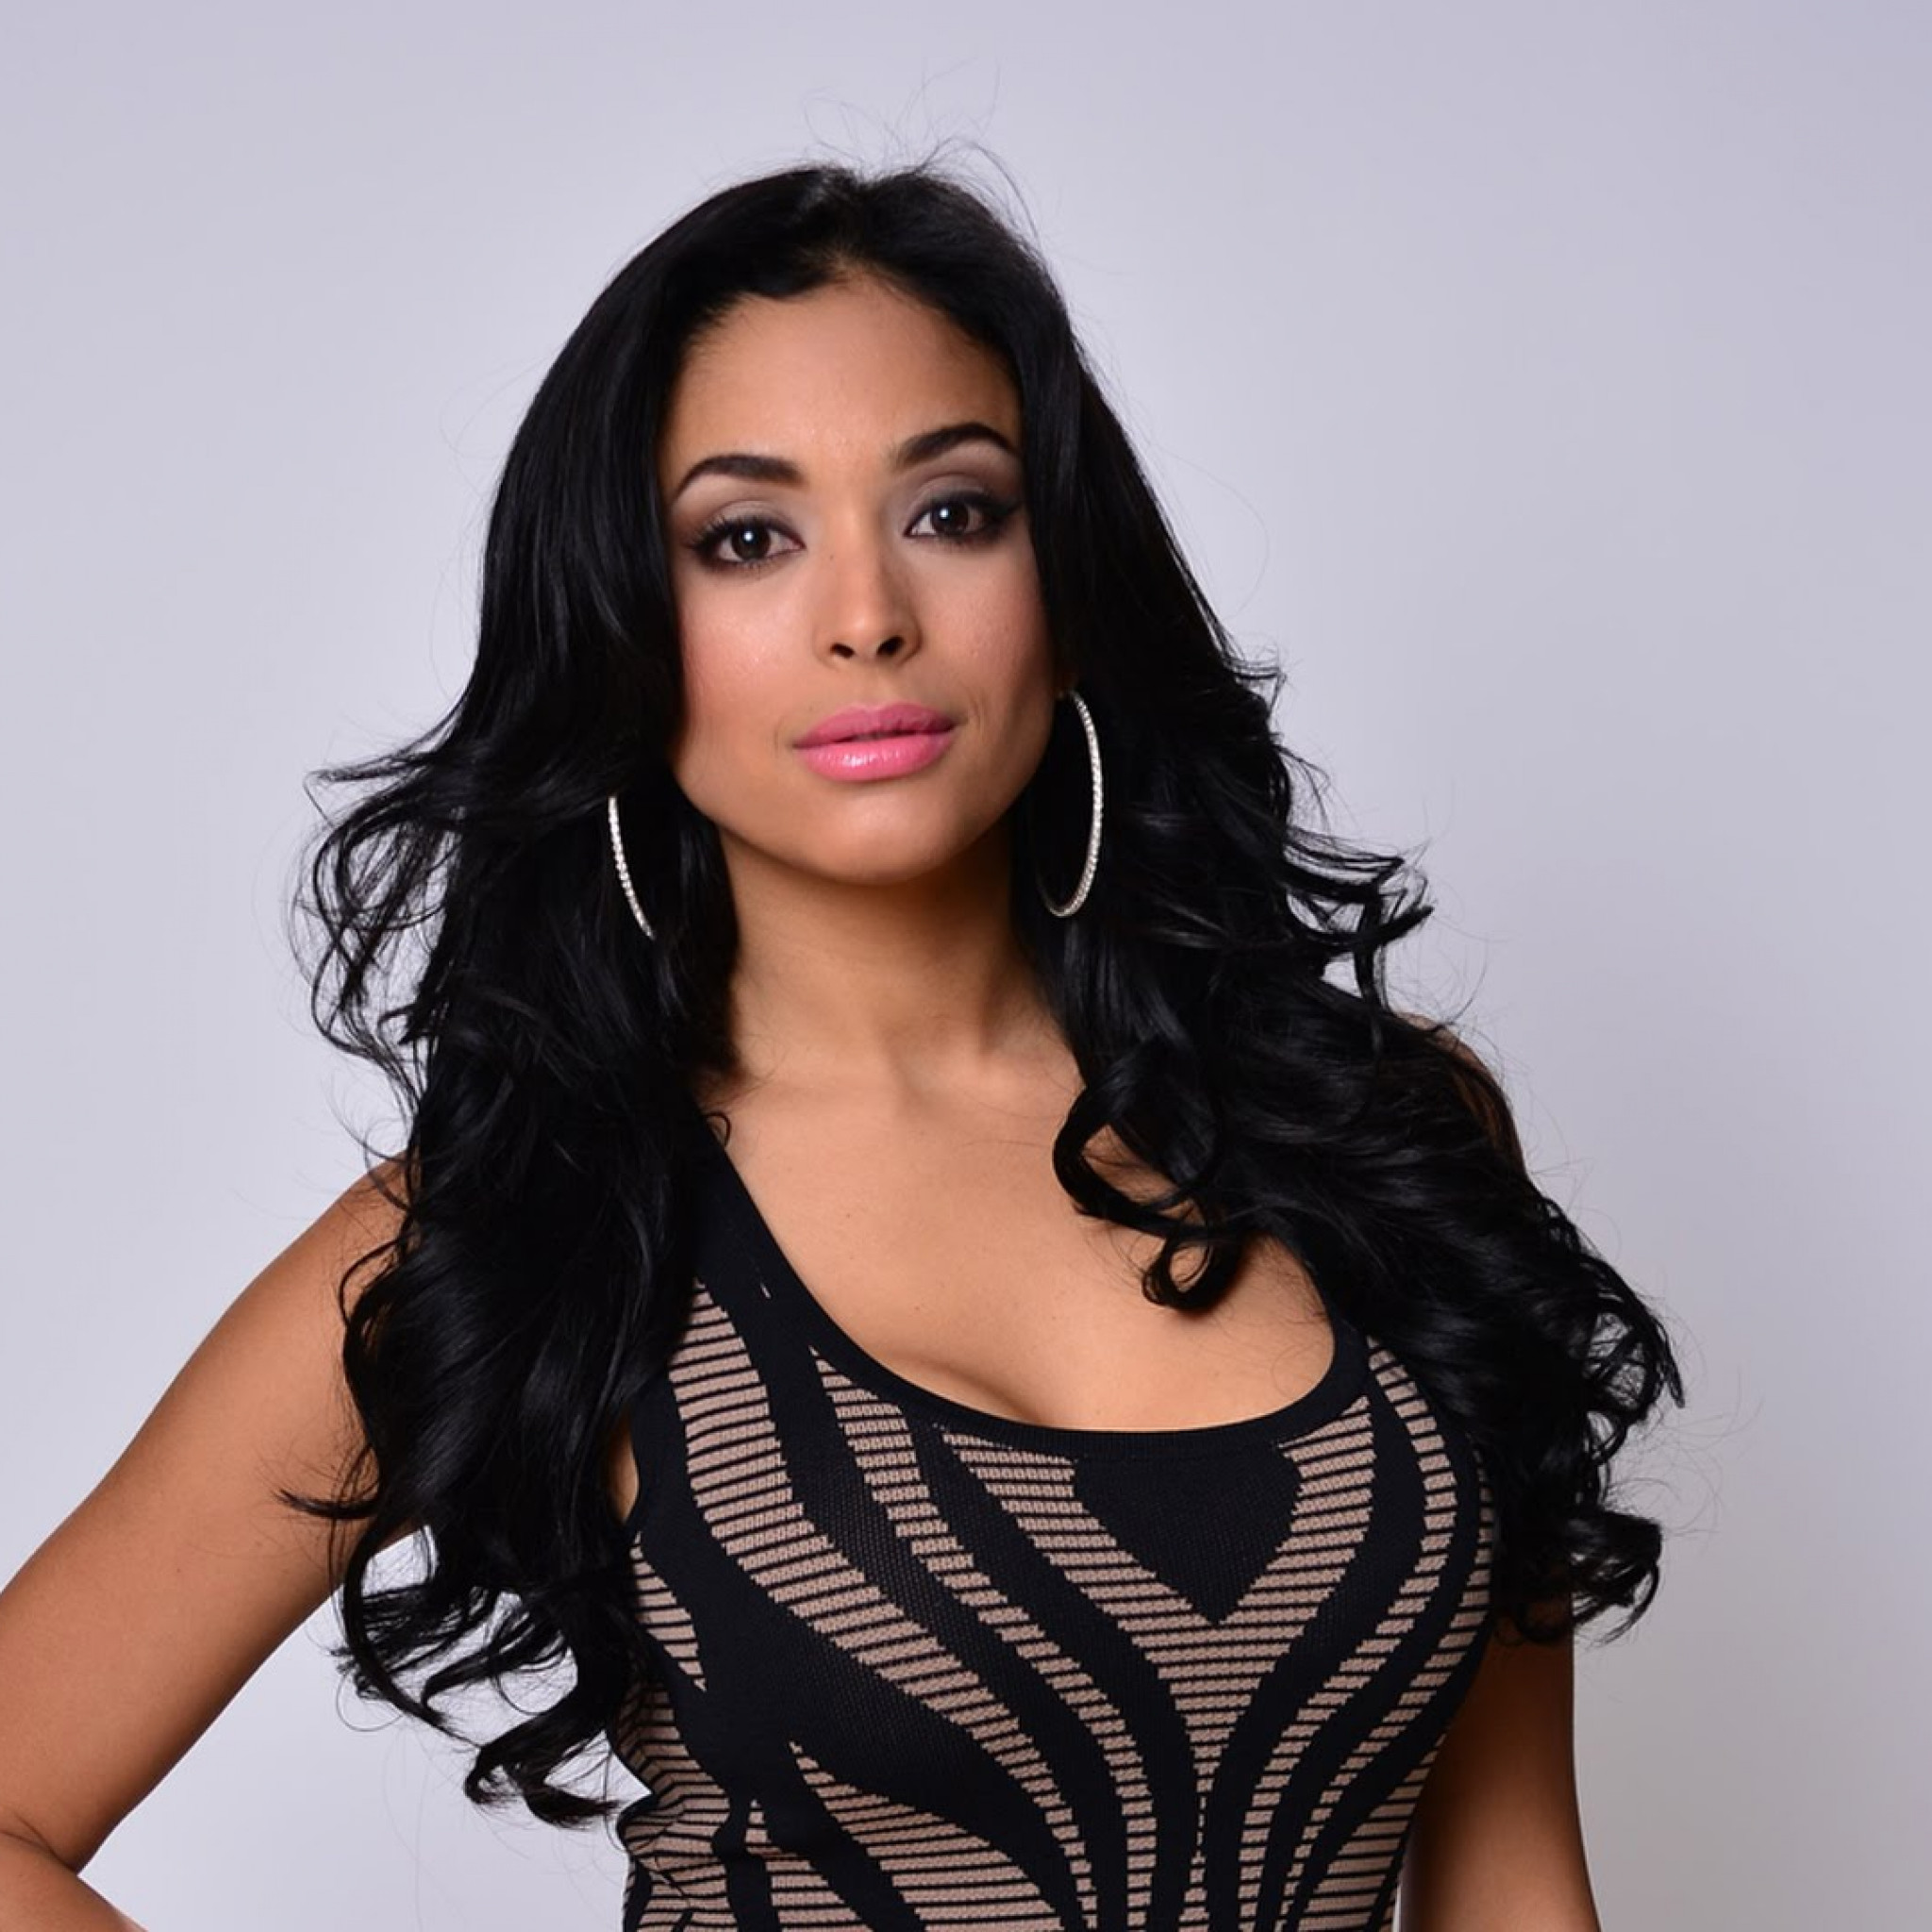 Latinas wallpaper